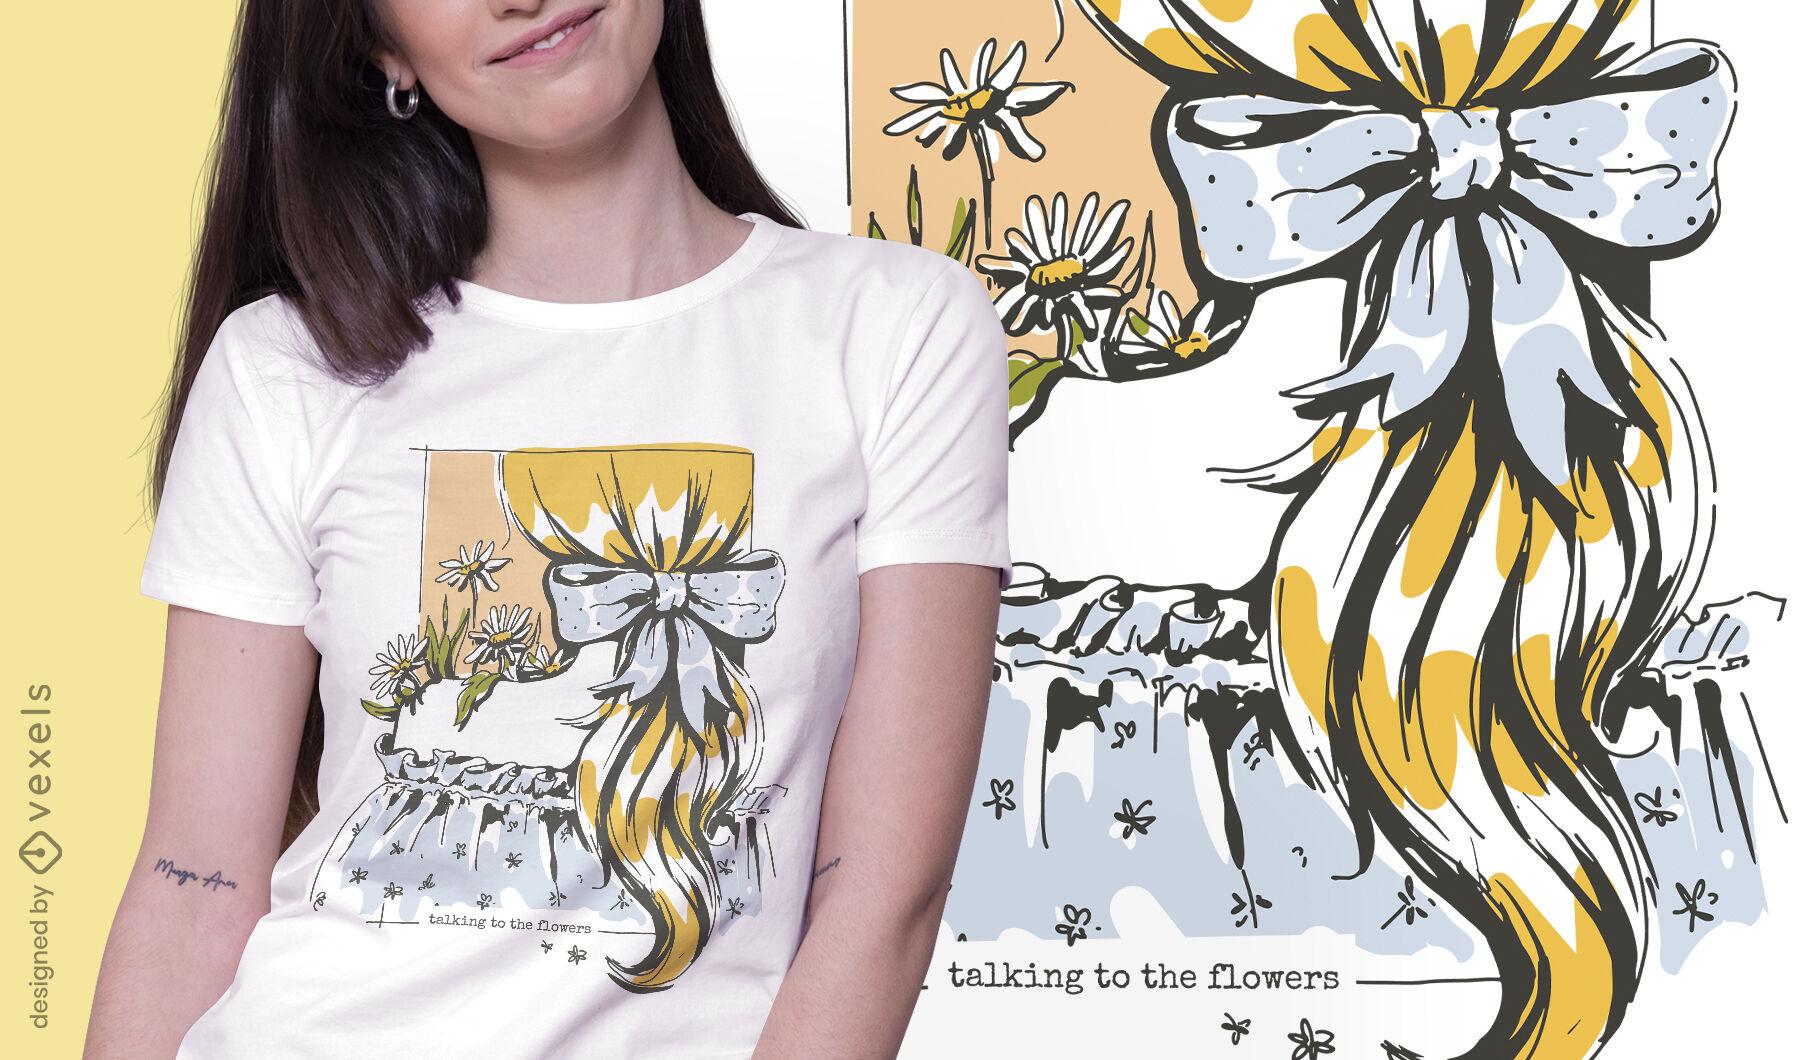 Design de t-shirt feminina estilo de vida Cottagecore